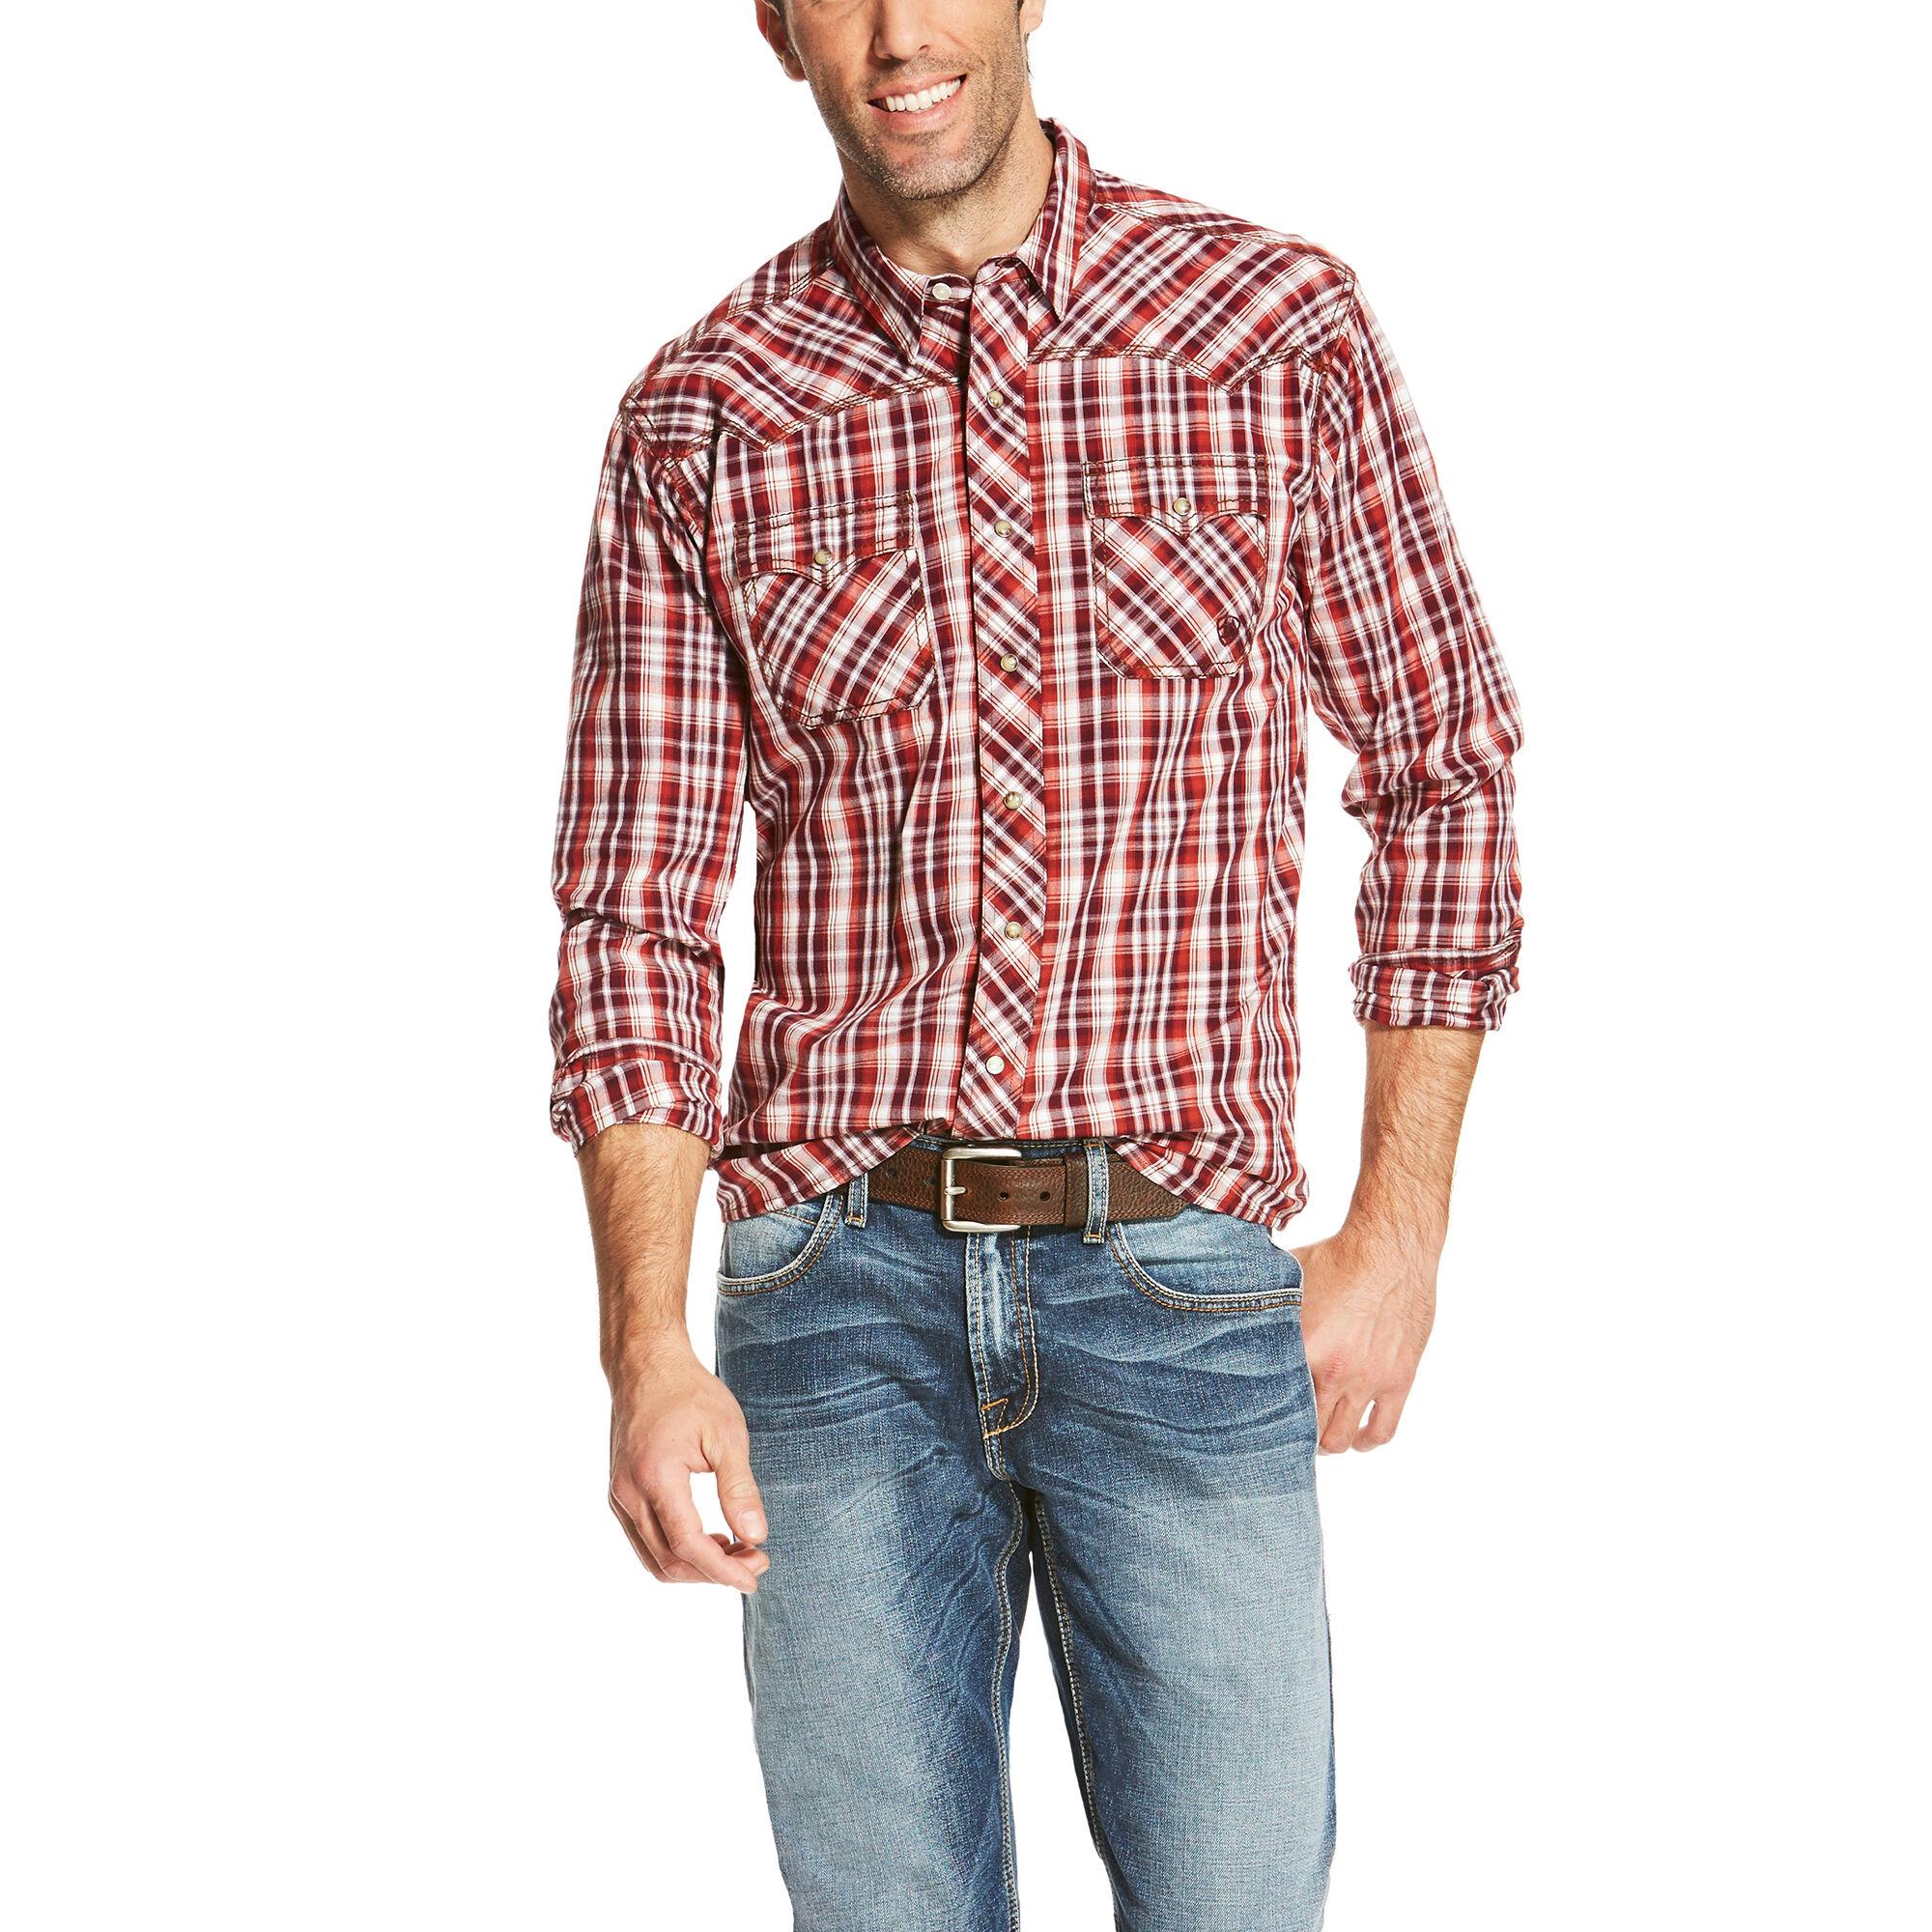 Urbana Retro Shirt